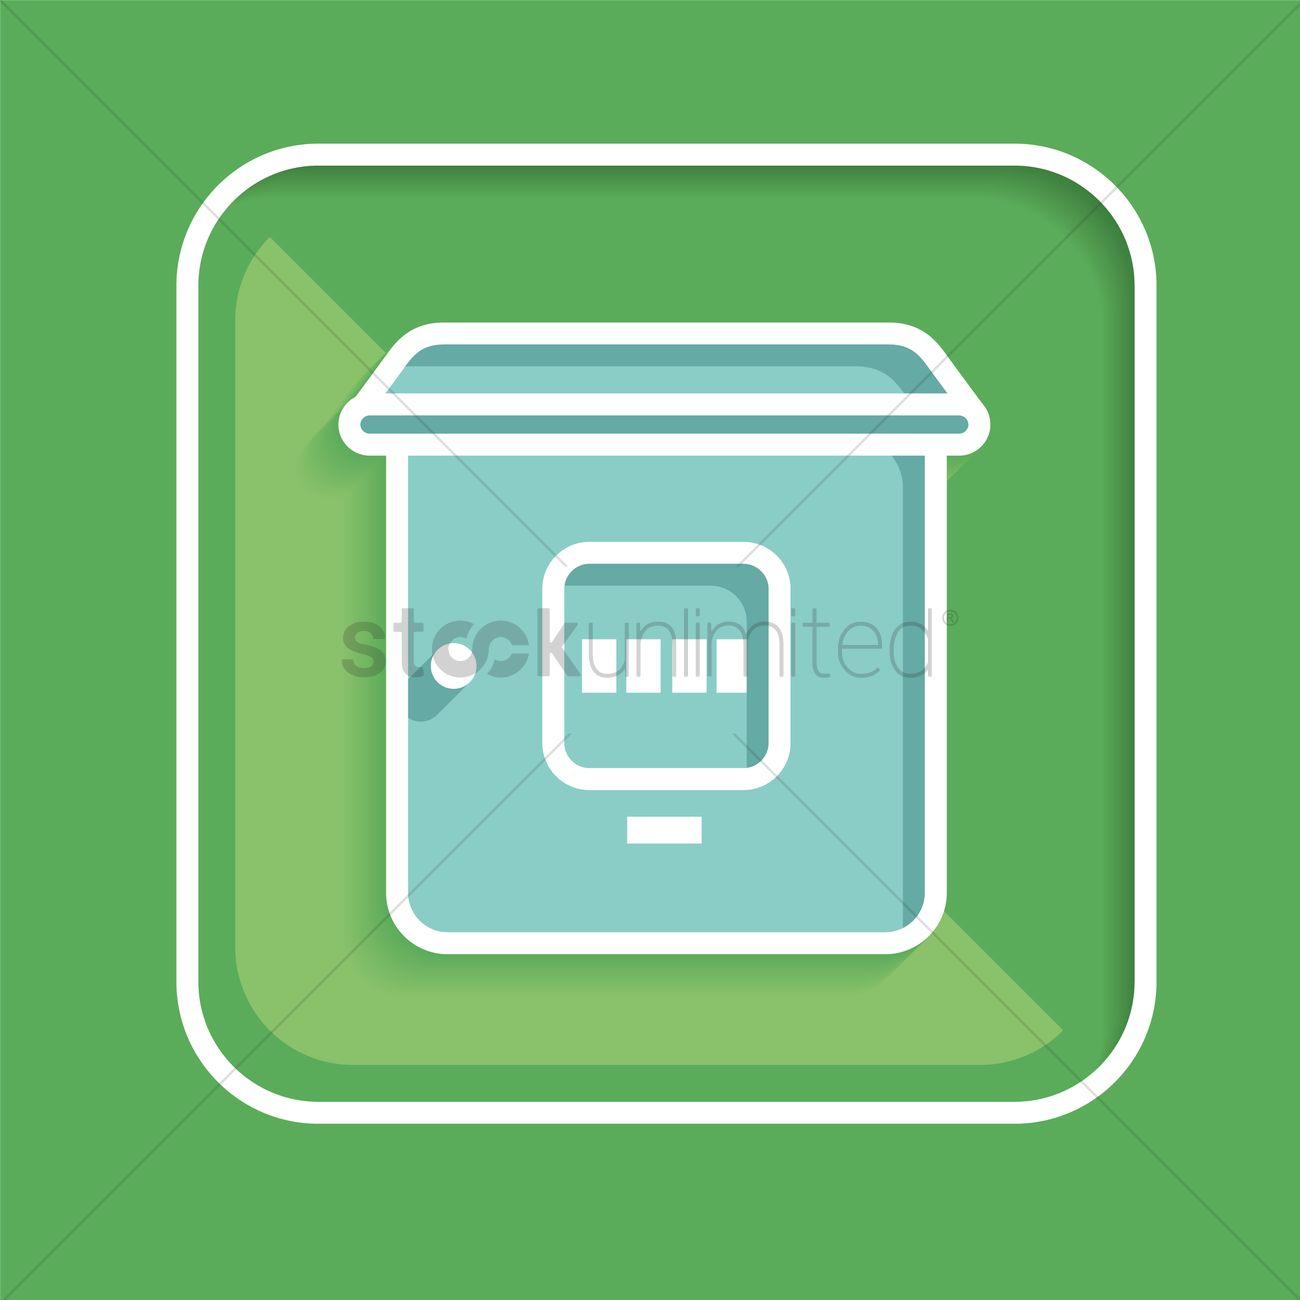 Free Meter box Vector Image - 1390292 | StockUnlimited